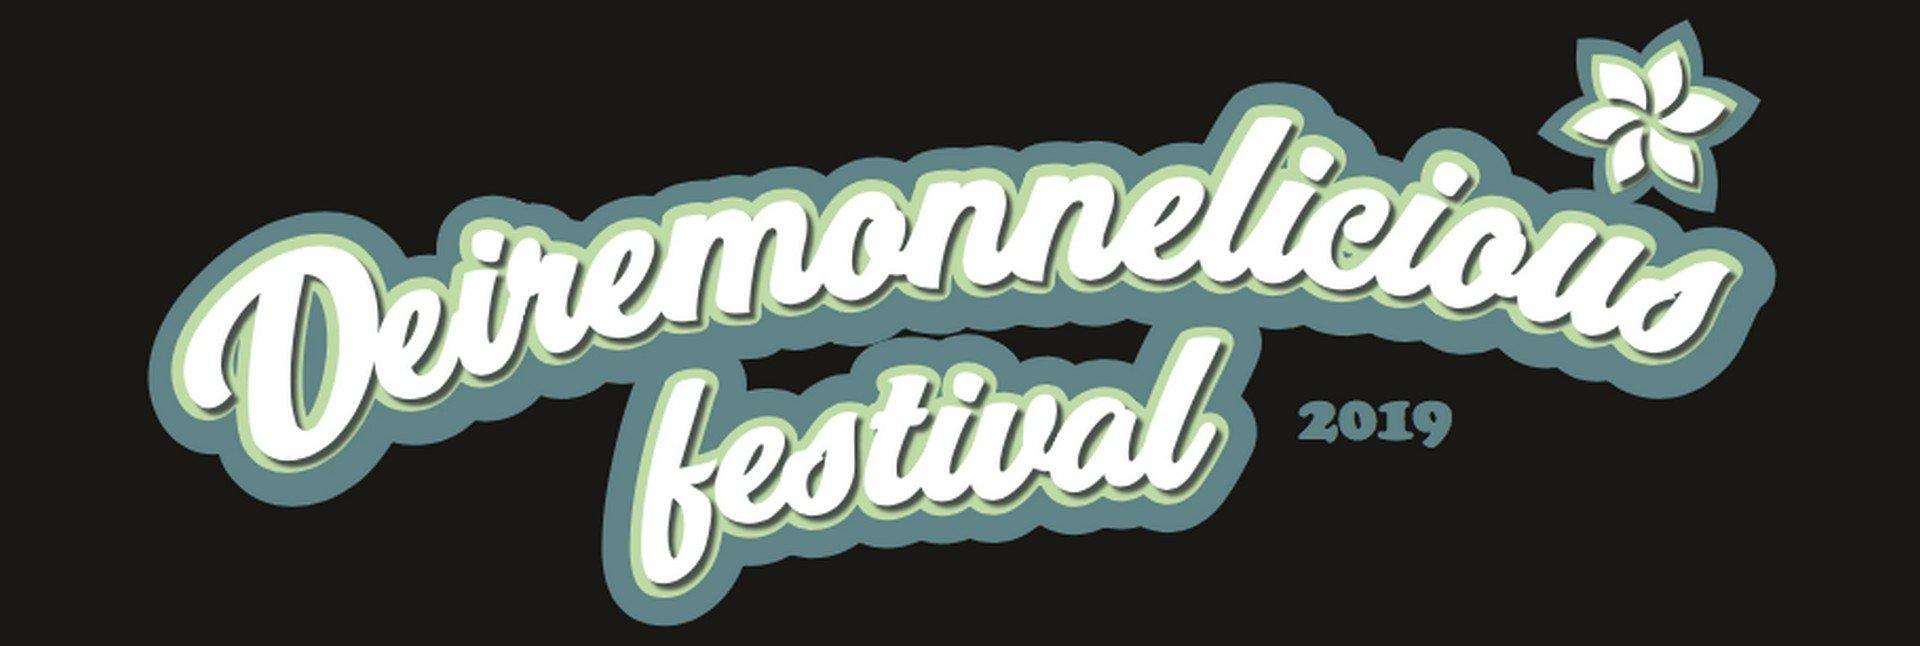 Eerste editie van 'Deiremonnelicious Festival'! - Logo Dendermonds stadsfestival